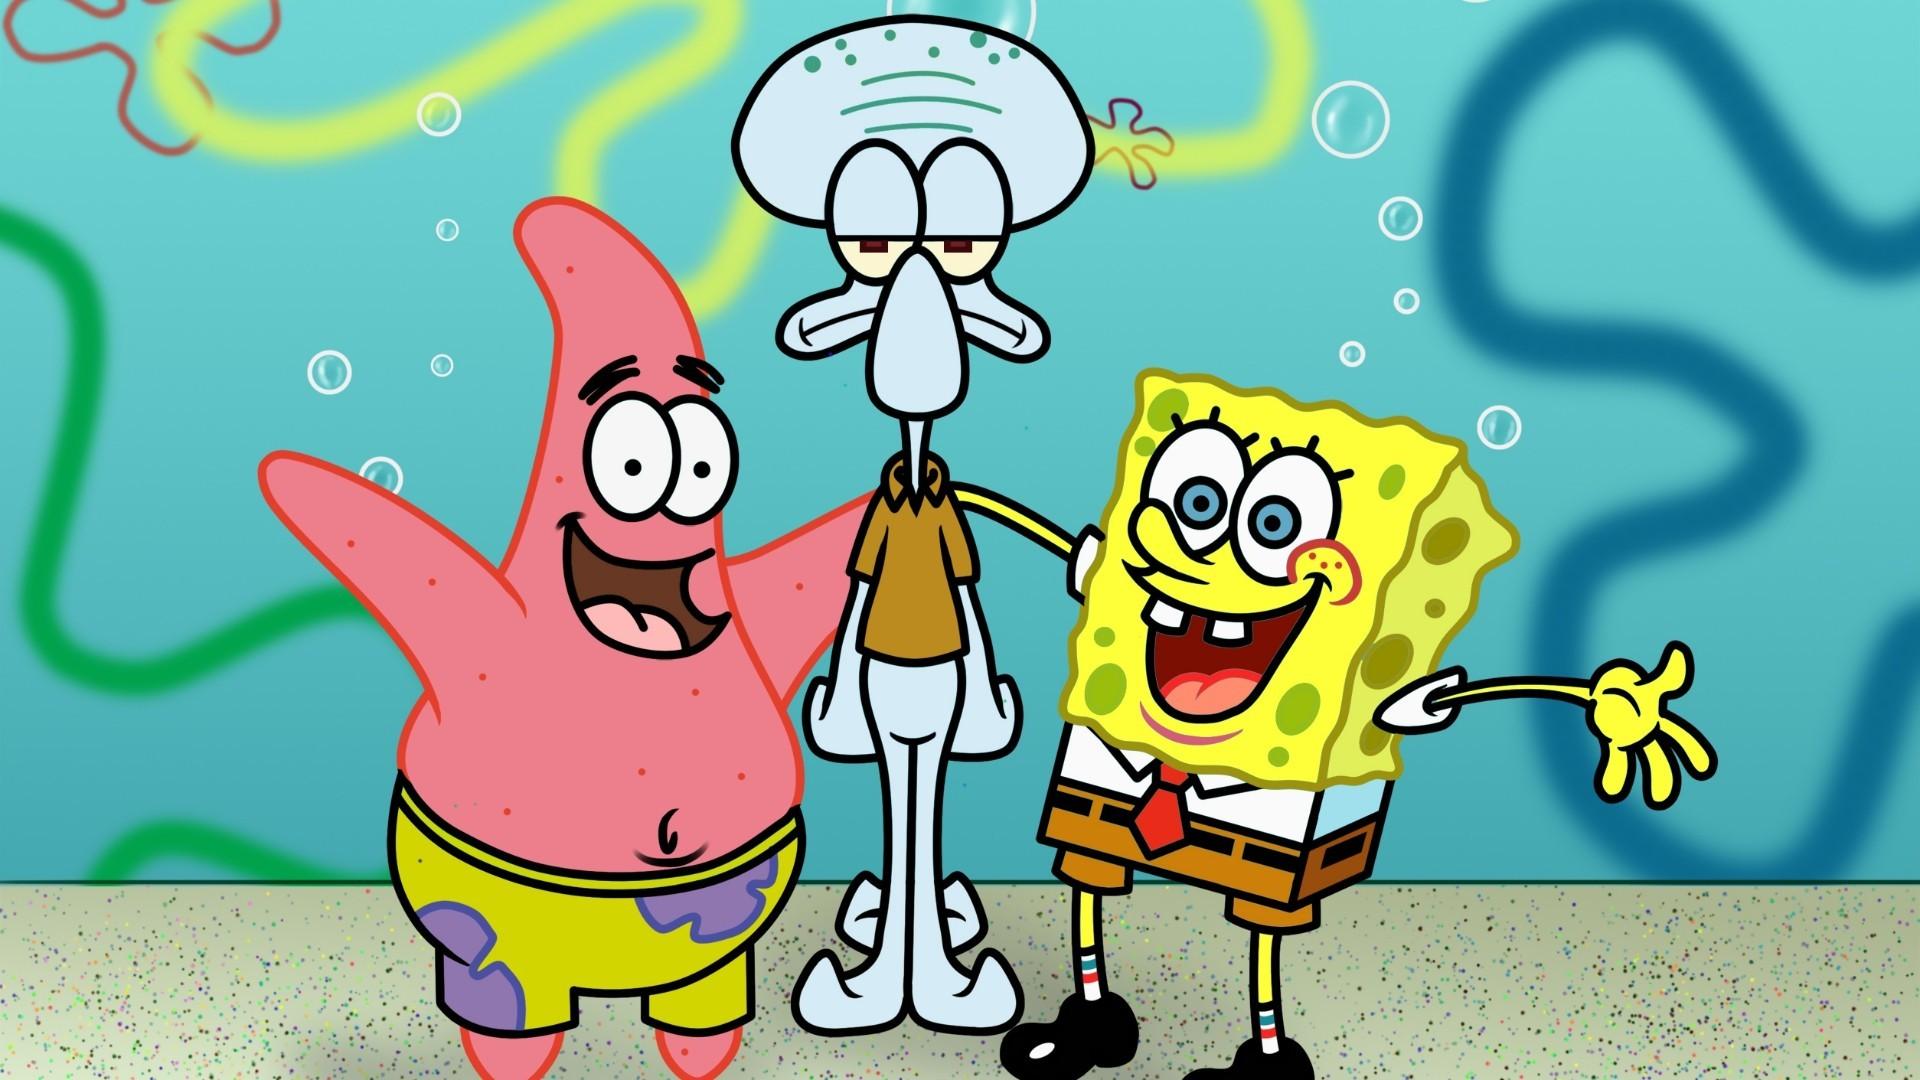 SpongeBob SquarePants 1920x1080